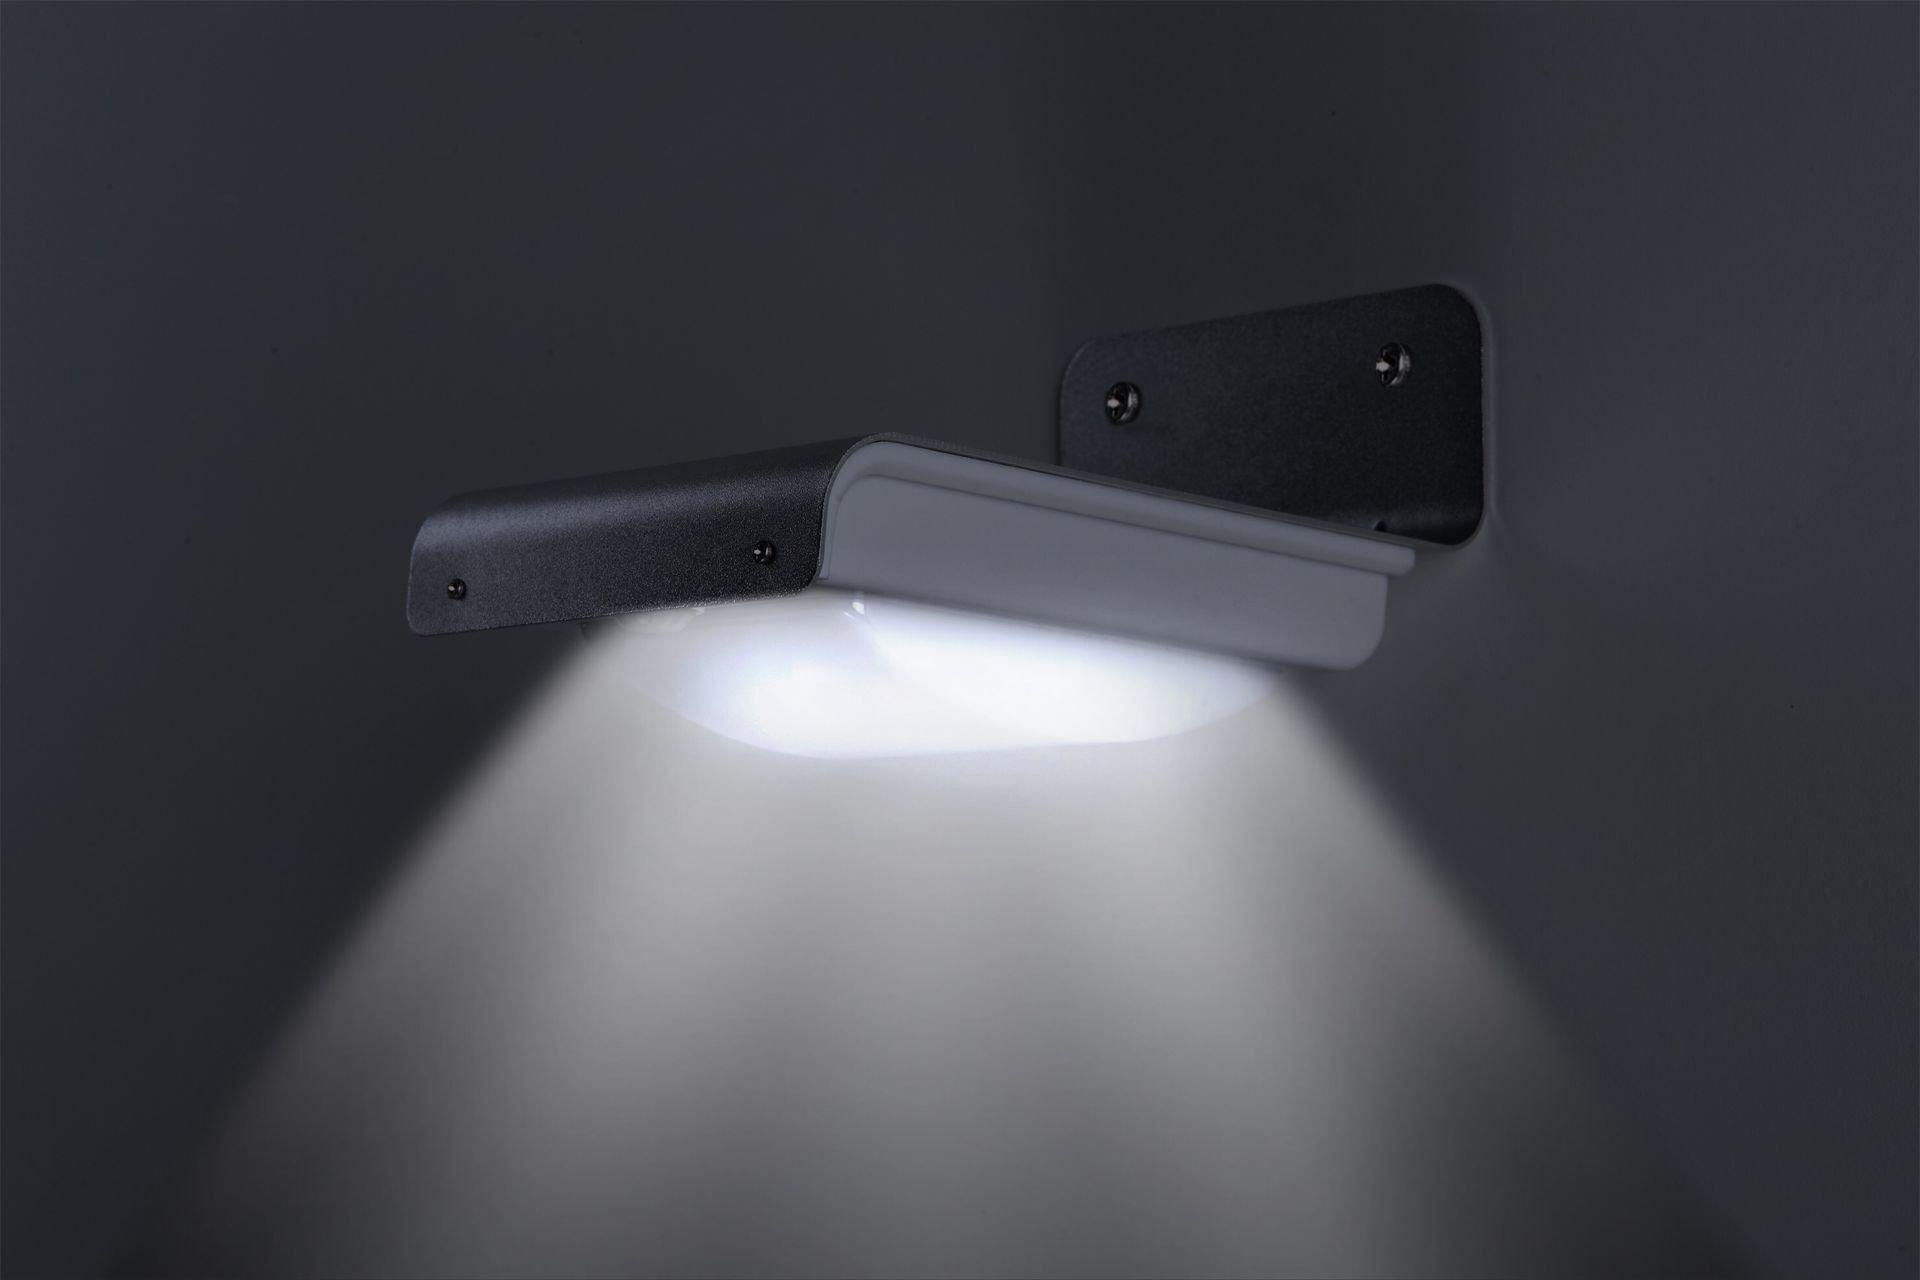 Solar Motion Sensor Light,Boens 16 LED Sensor Lamp Waterproof Outdoor wall Lights led lamps Solar Power Motion Sensor Garden Security Lamp